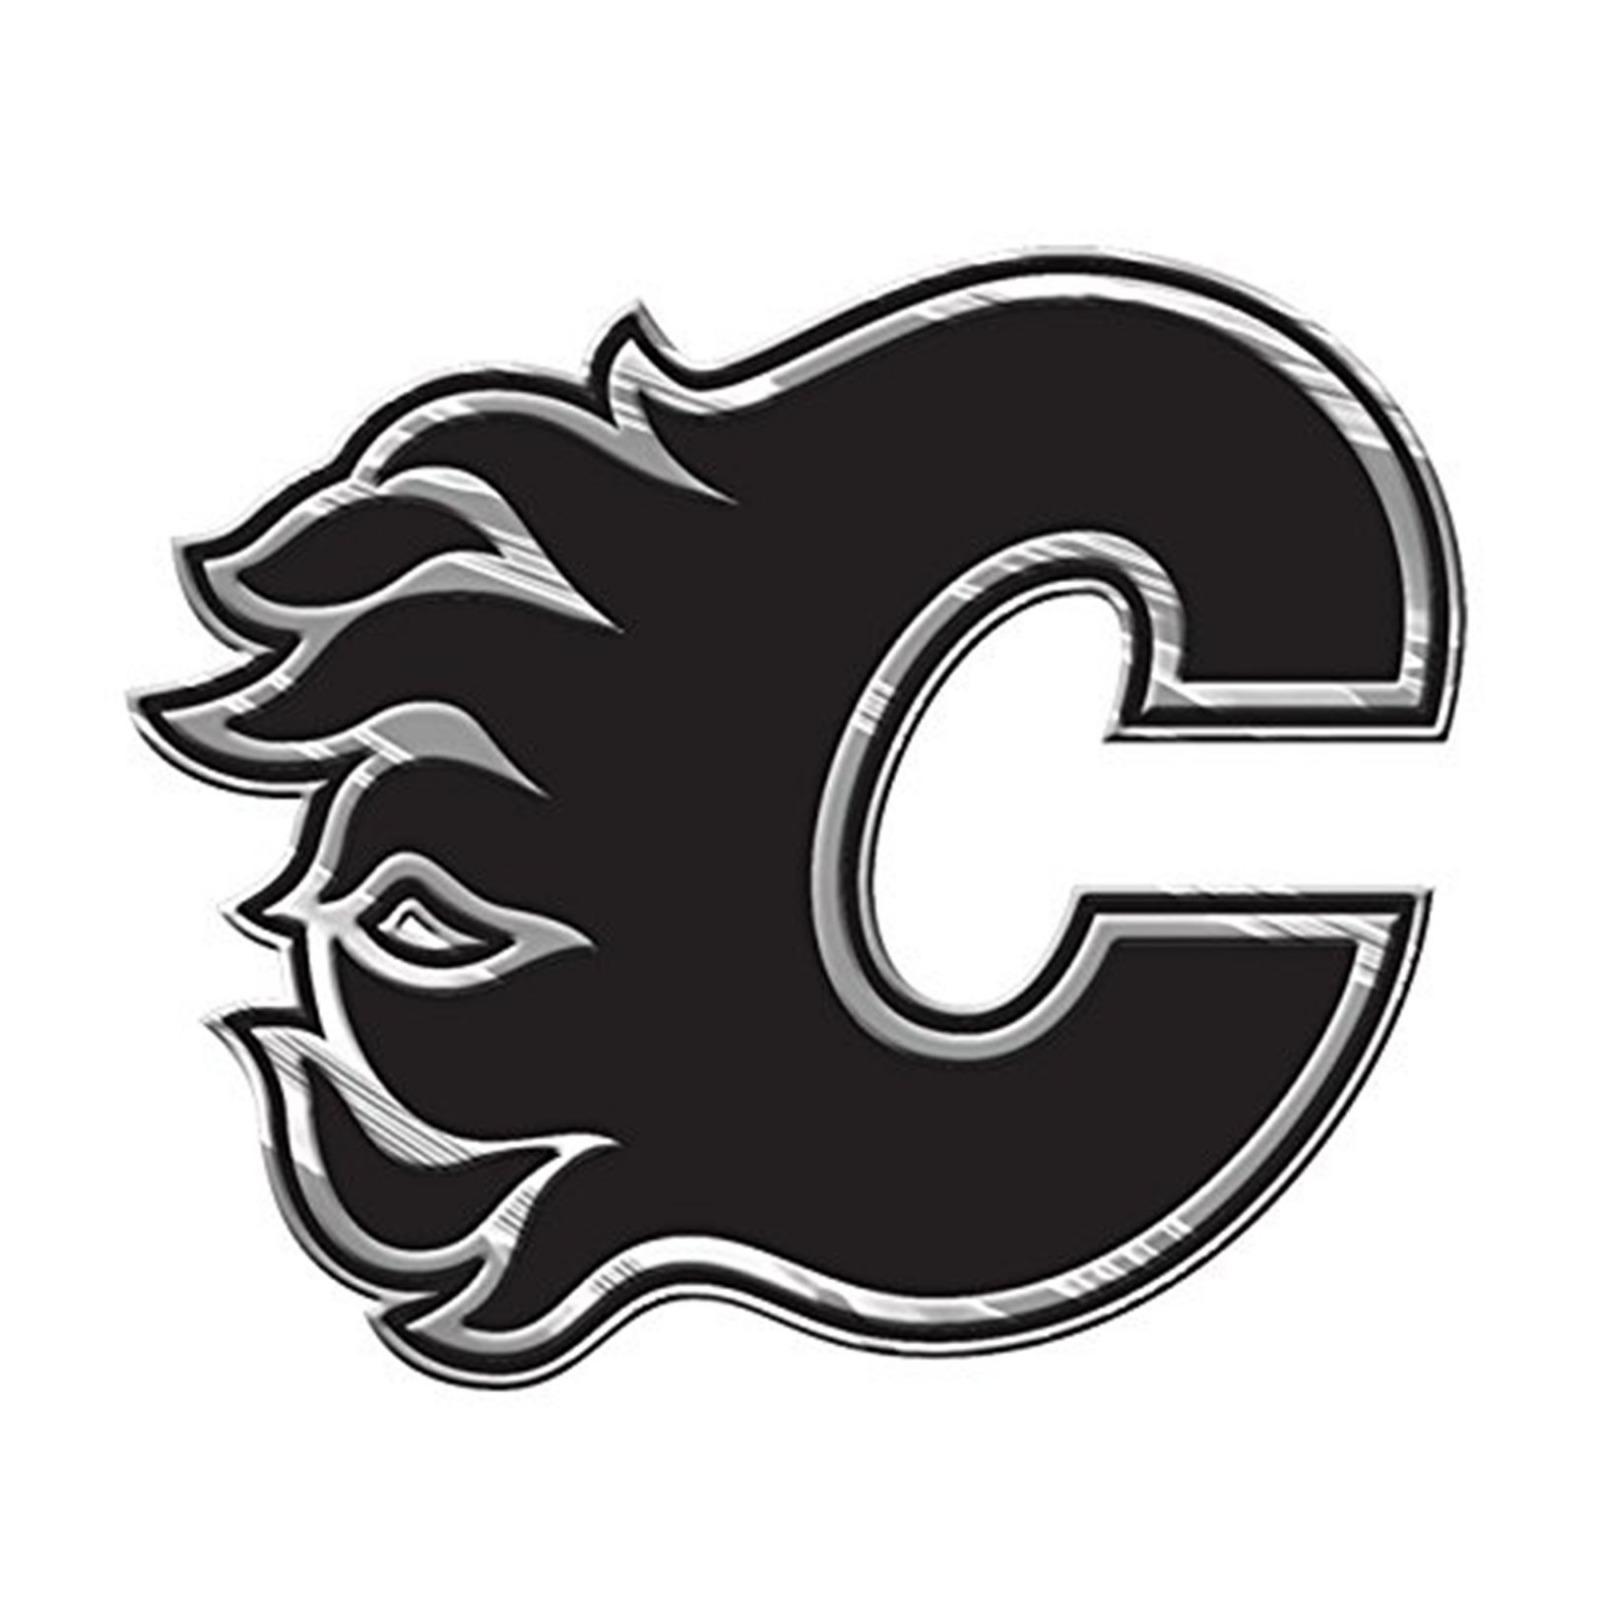 Calgary Flames Premium Solid Metal Chrome Auto Emblem Raised Decal Hockey Ebay